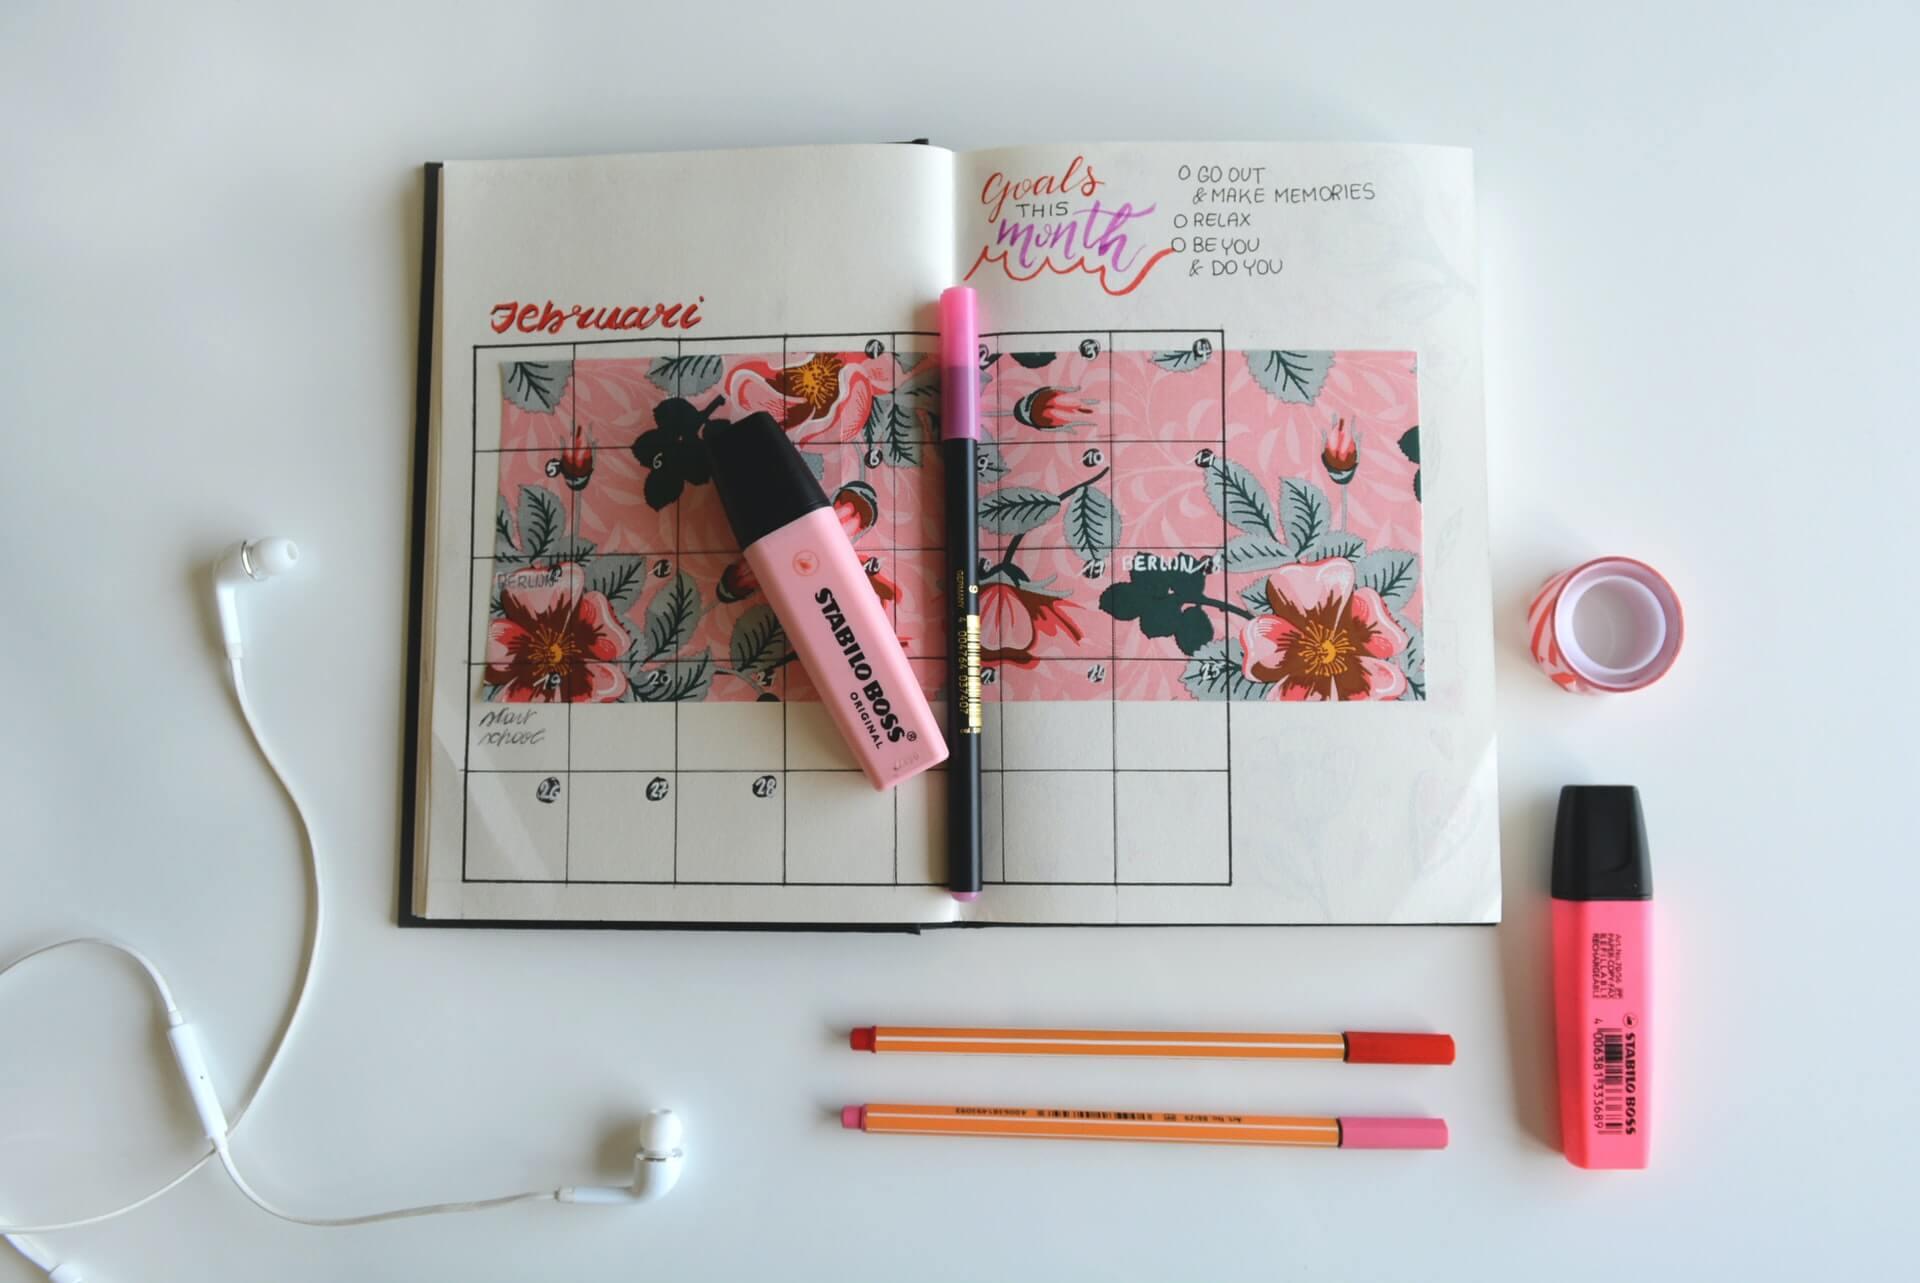 a spring calendar full of activities